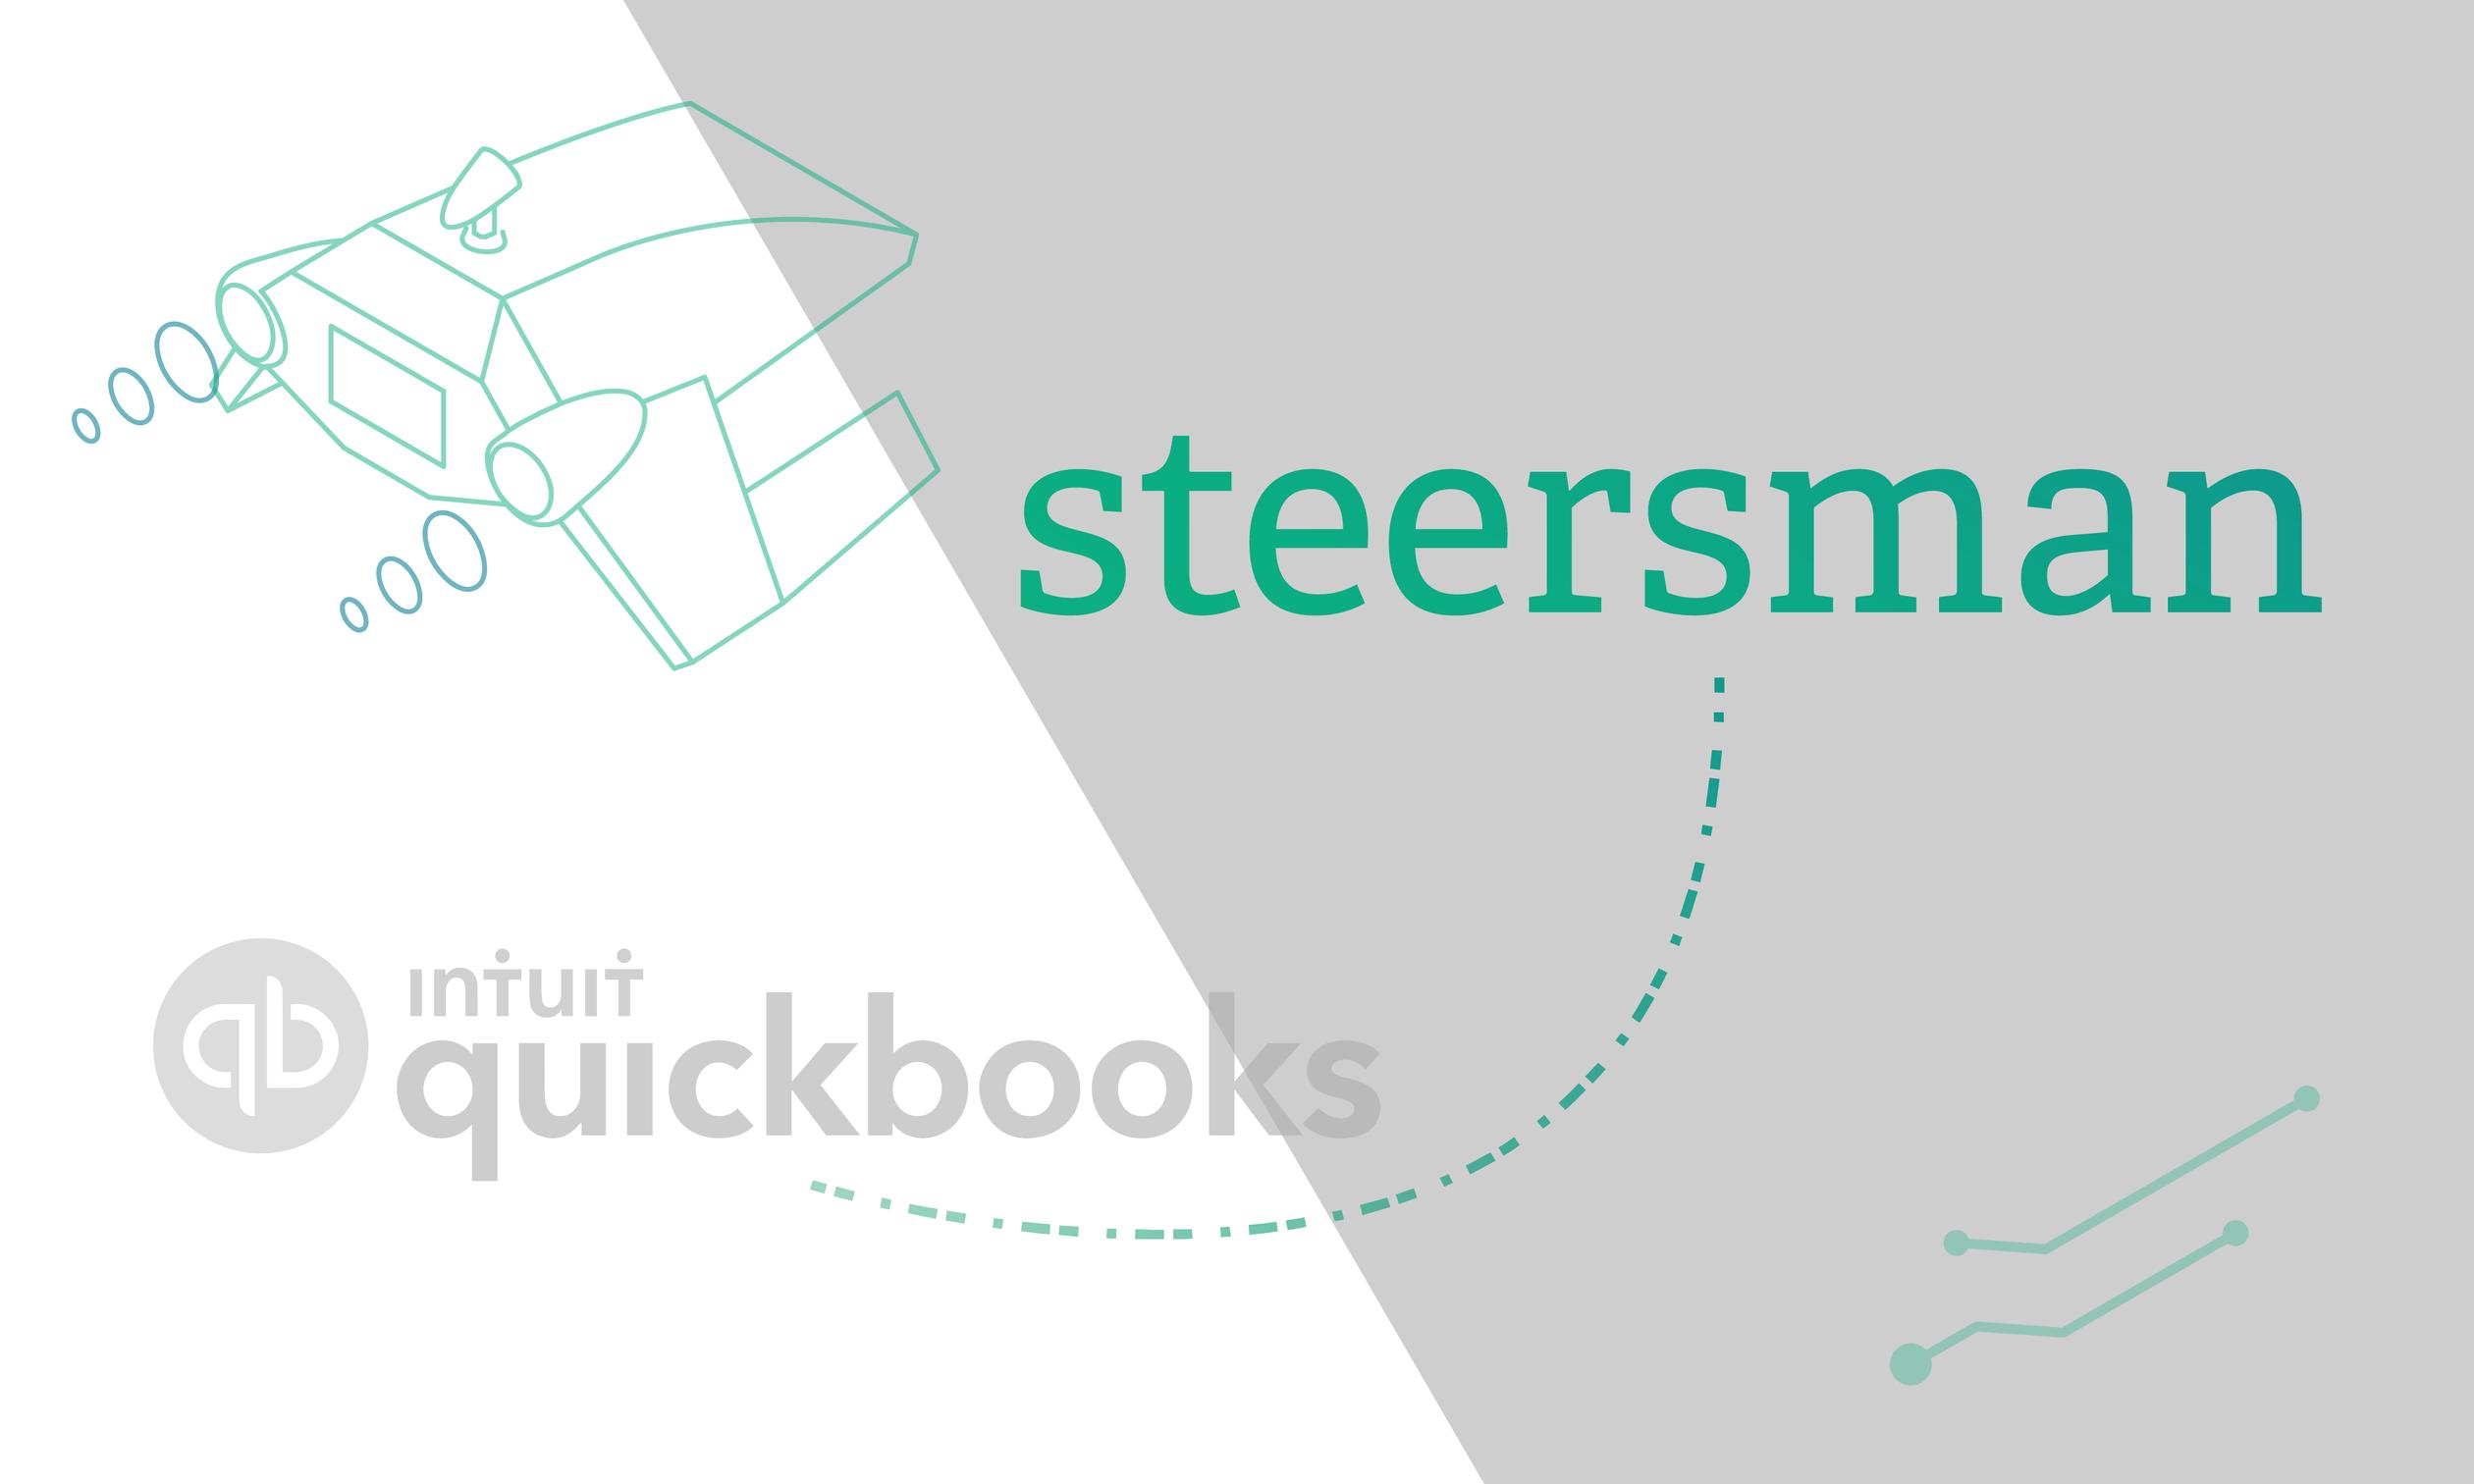 quickbooks steersman migration.png